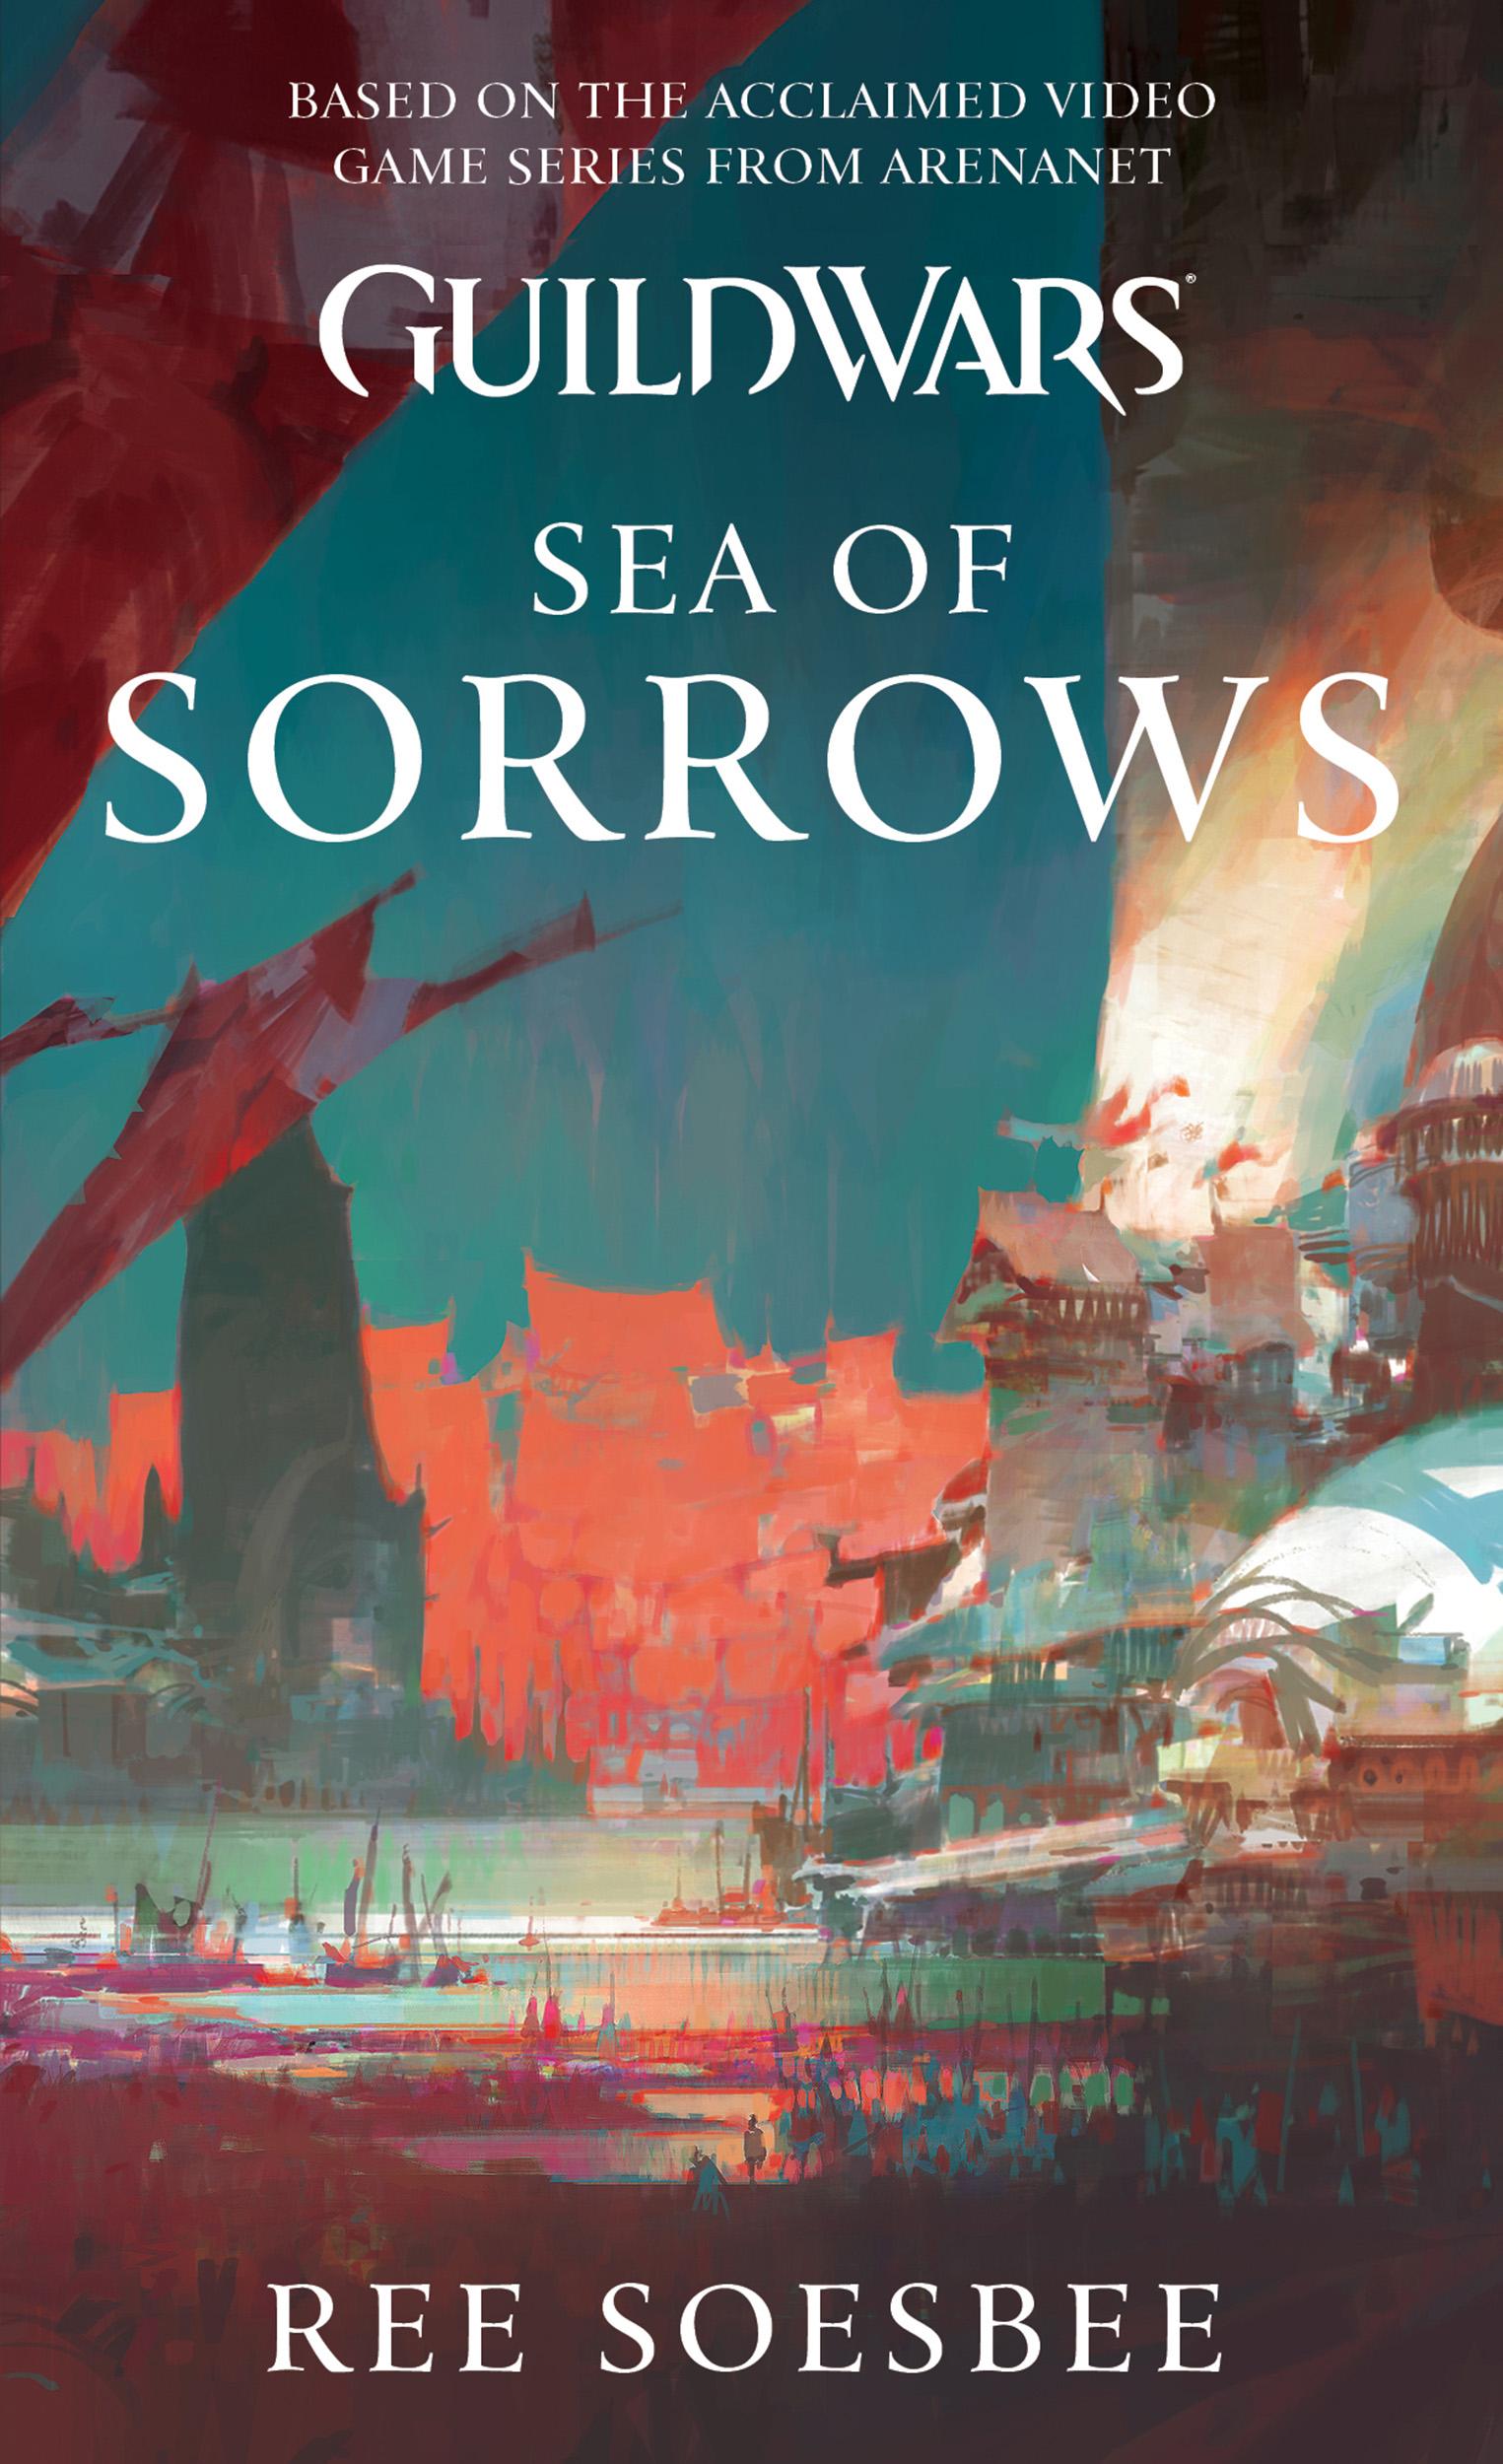 Guild Wars: Sea of Sorrows | Book by Ree Soesbee | Official